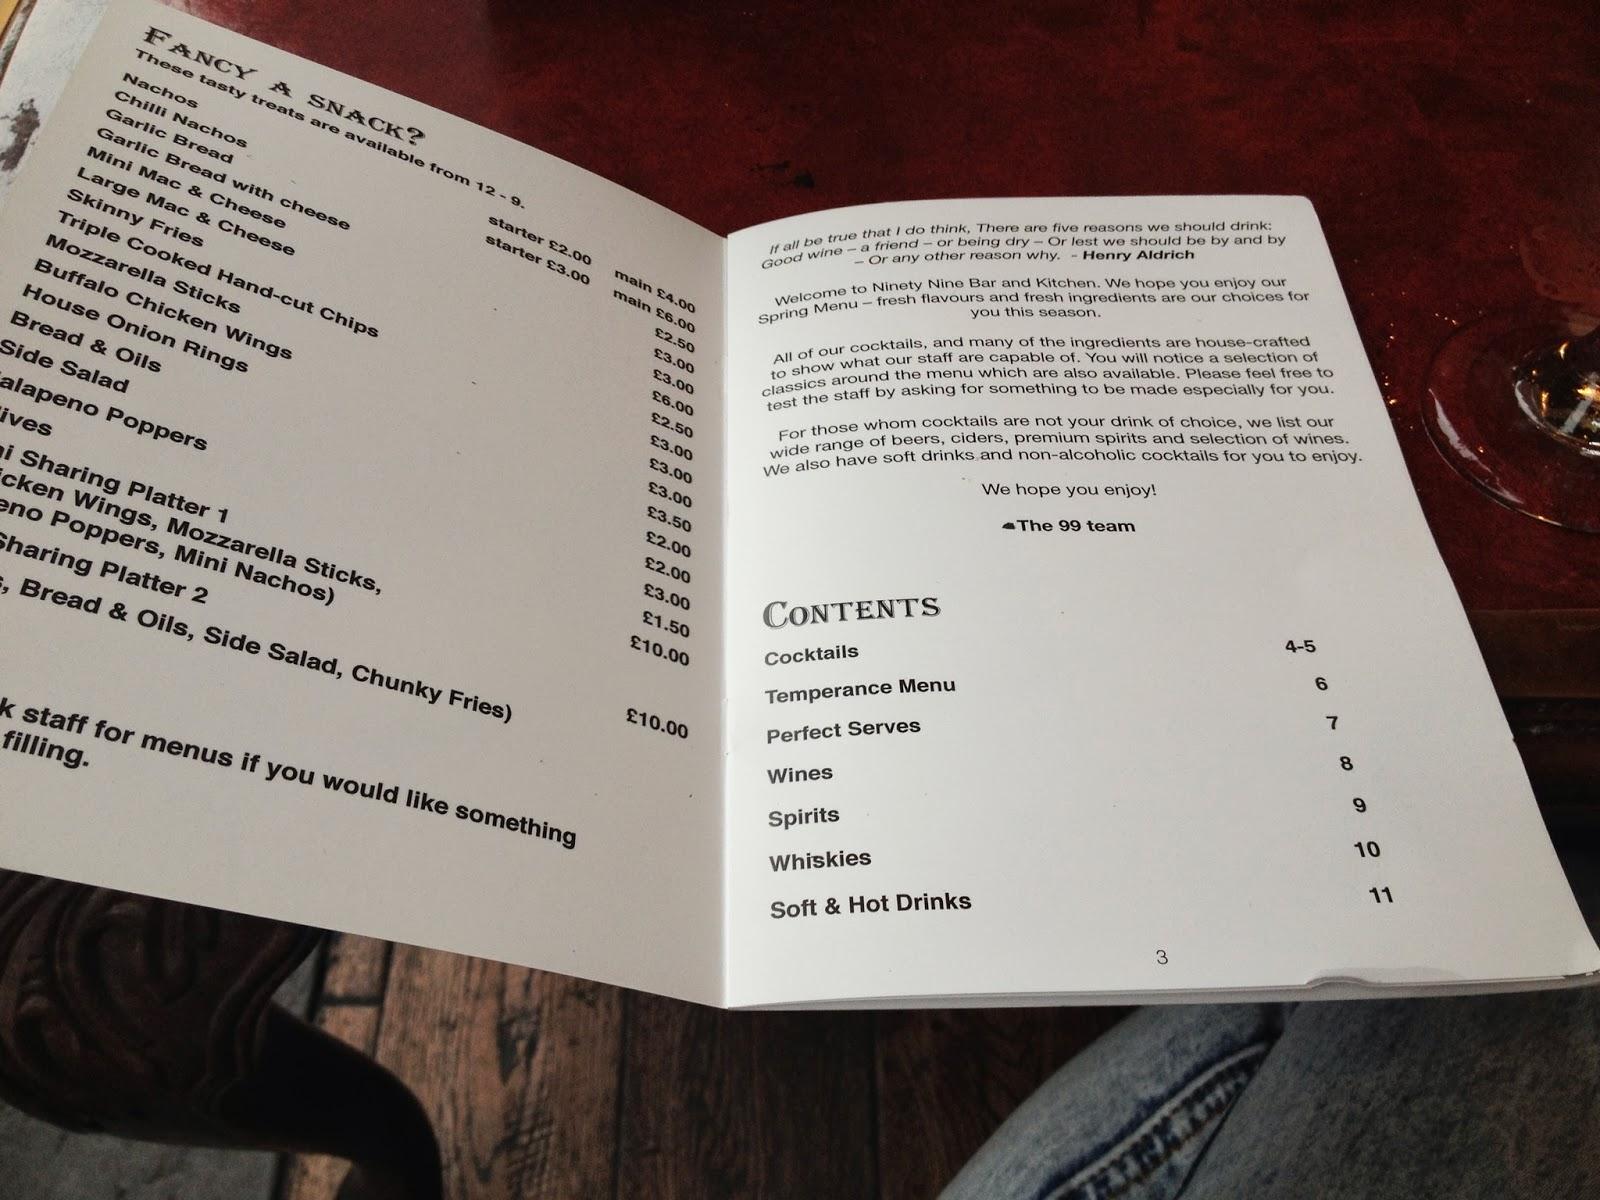 Ninety Nine Bar and Kitchen menu